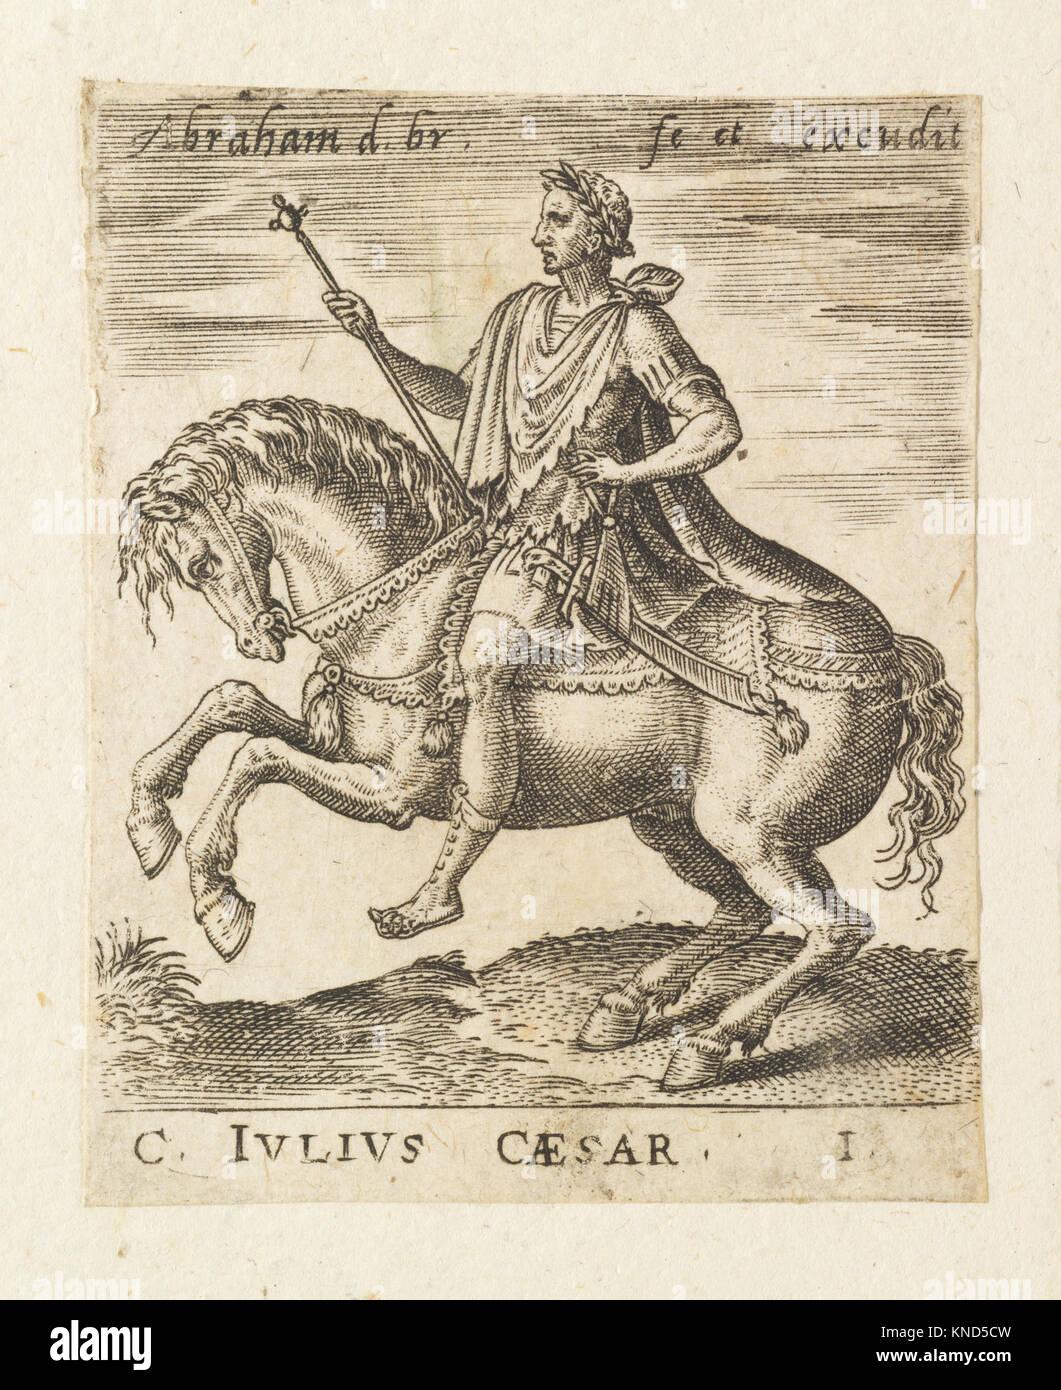 C. Julius Caesar from Twelve Caesars on Horseback MET DP-1340-001 732433 Stock Photo